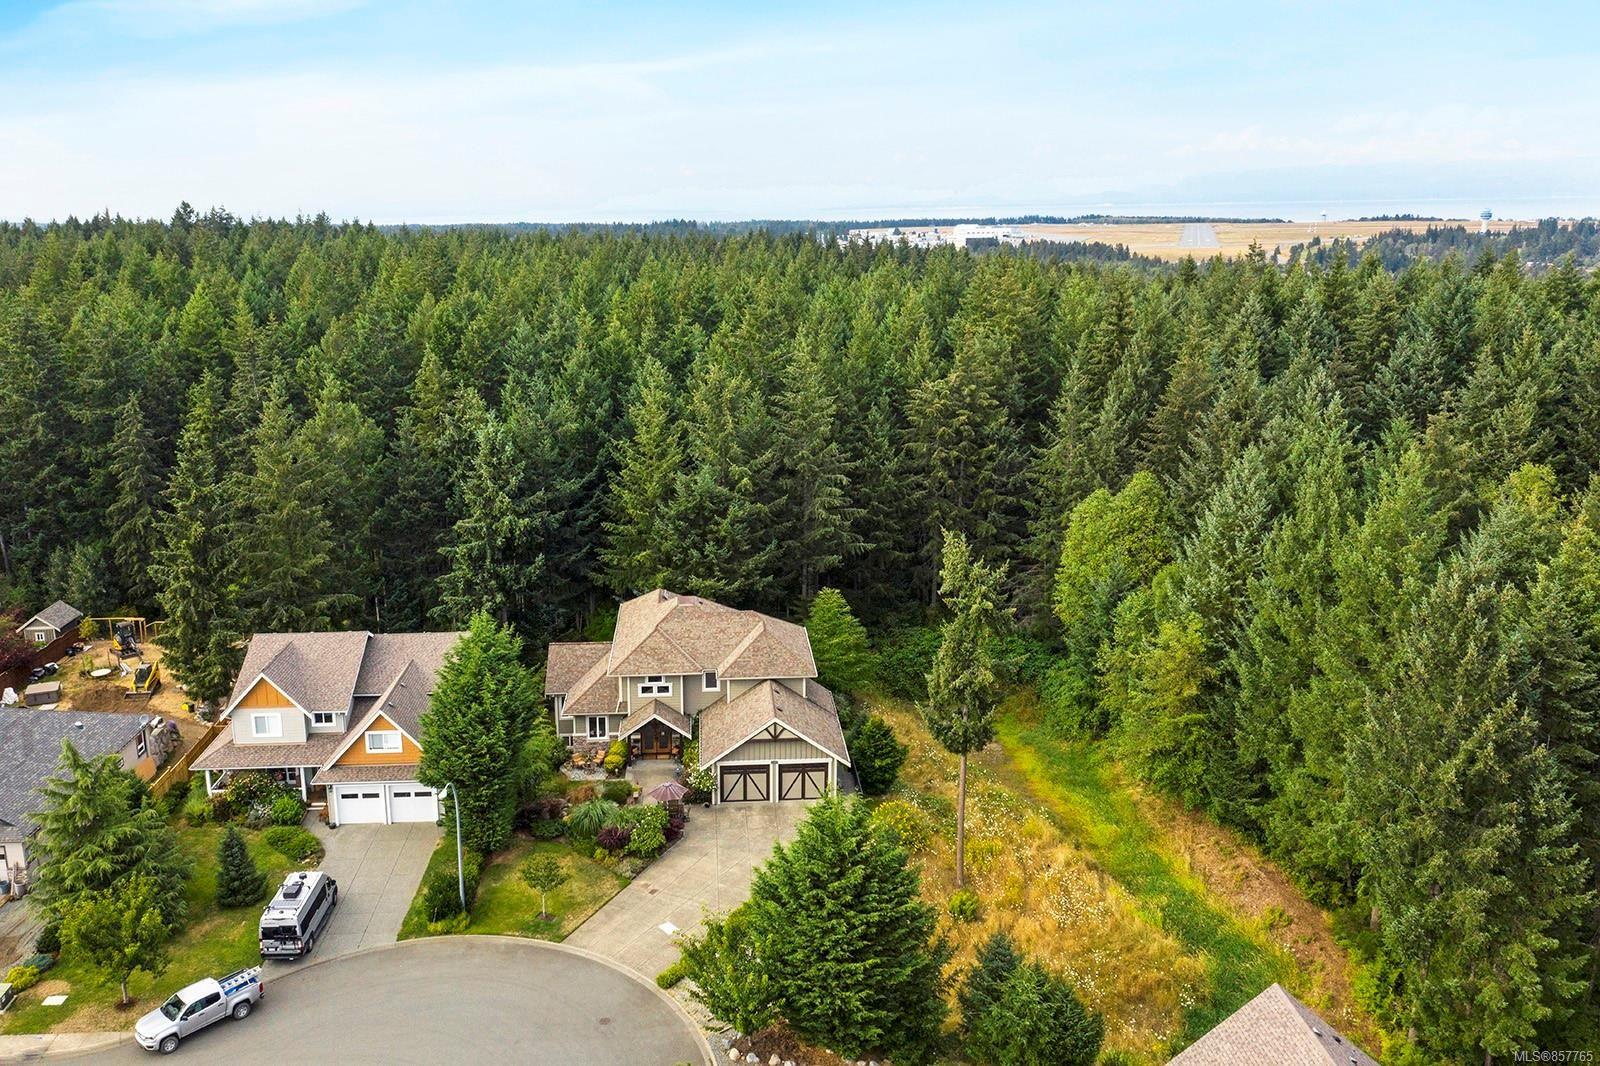 Photo 47: Photos: 1516 Highridge Dr in : CV Comox (Town of) House for sale (Comox Valley)  : MLS®# 857765